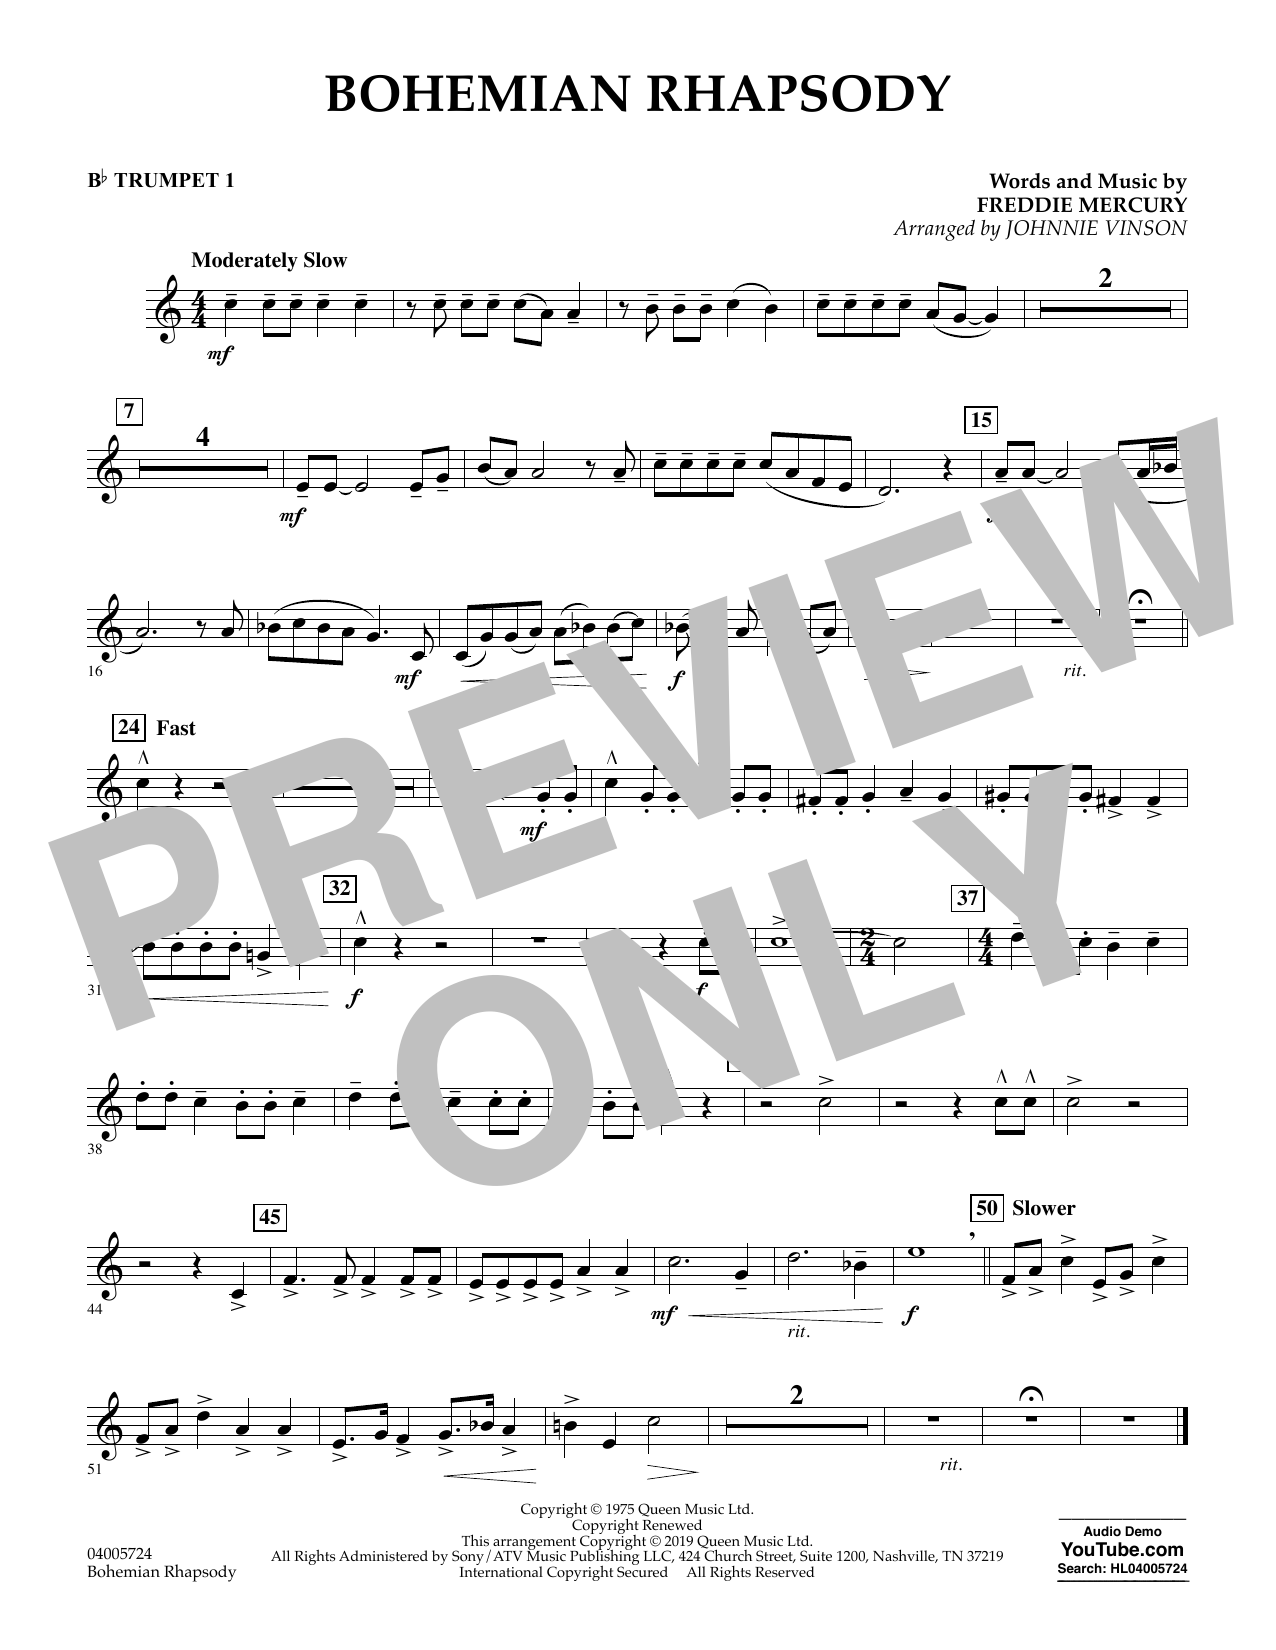 Bohemian Rhapsody (arr. Johnnie Vinson) - Bb Trumpet 1 (Concert Band)